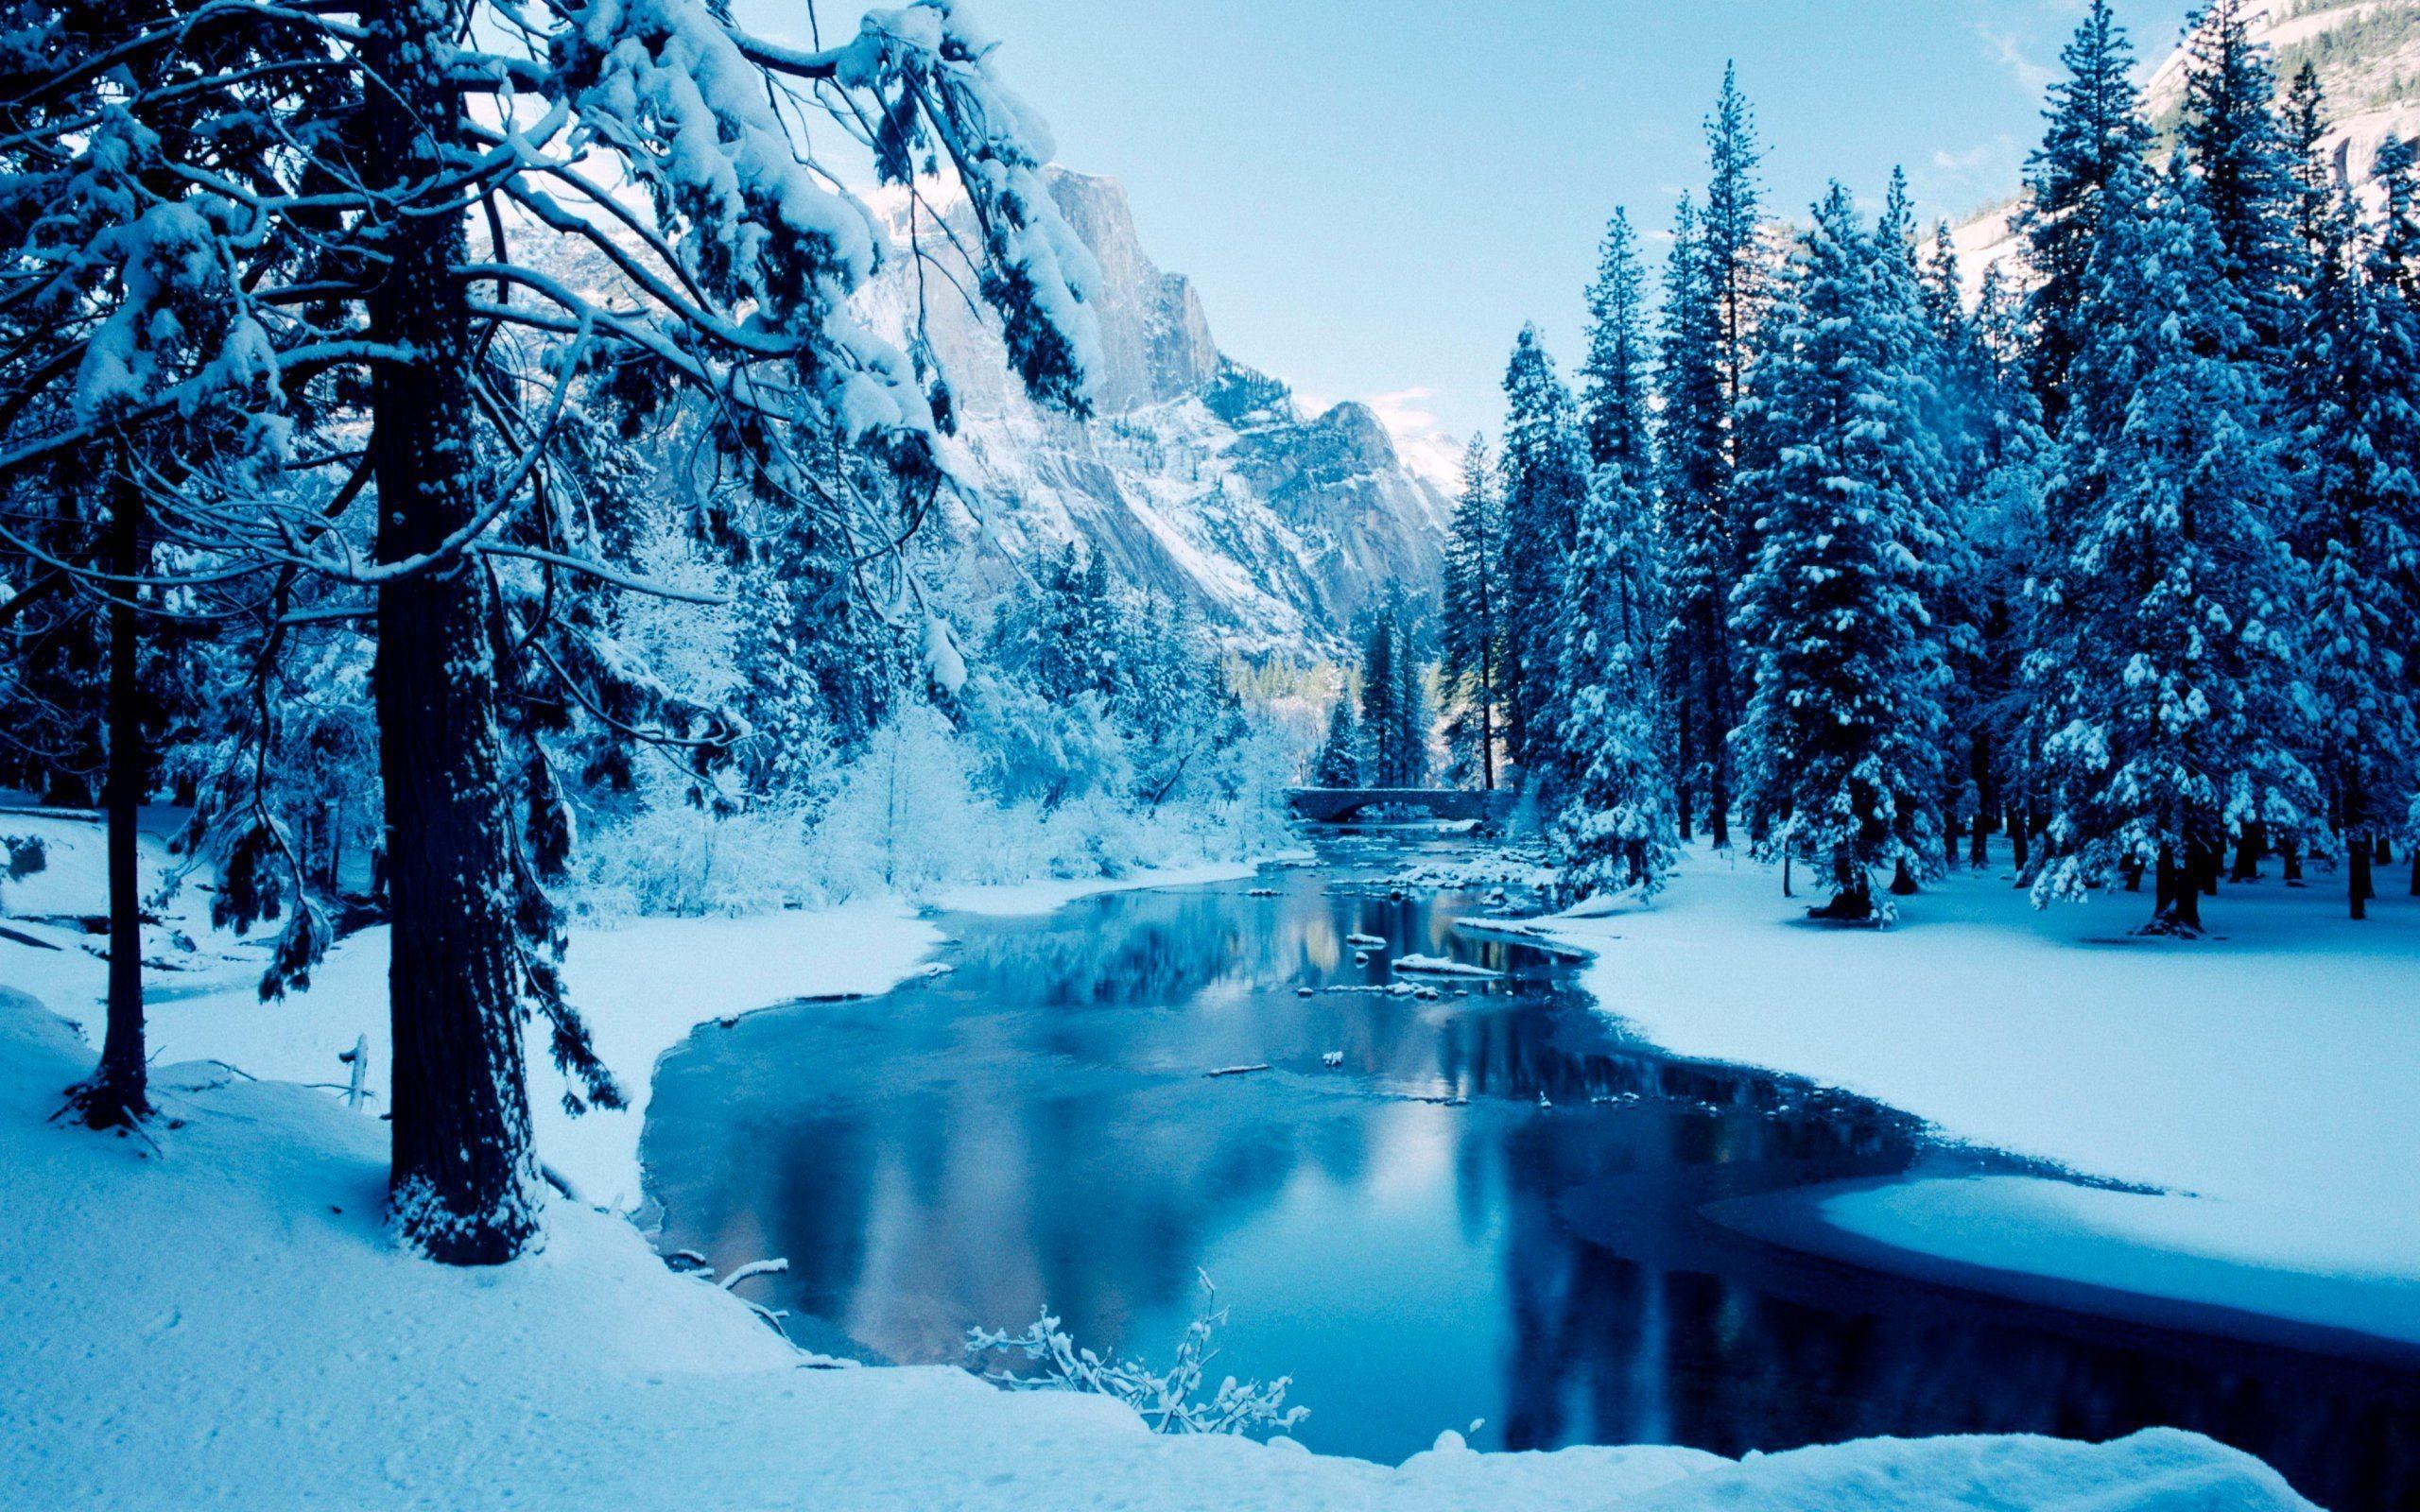 Beautiful-Winter-Scenes-Desktop-Wallpaper.jpg